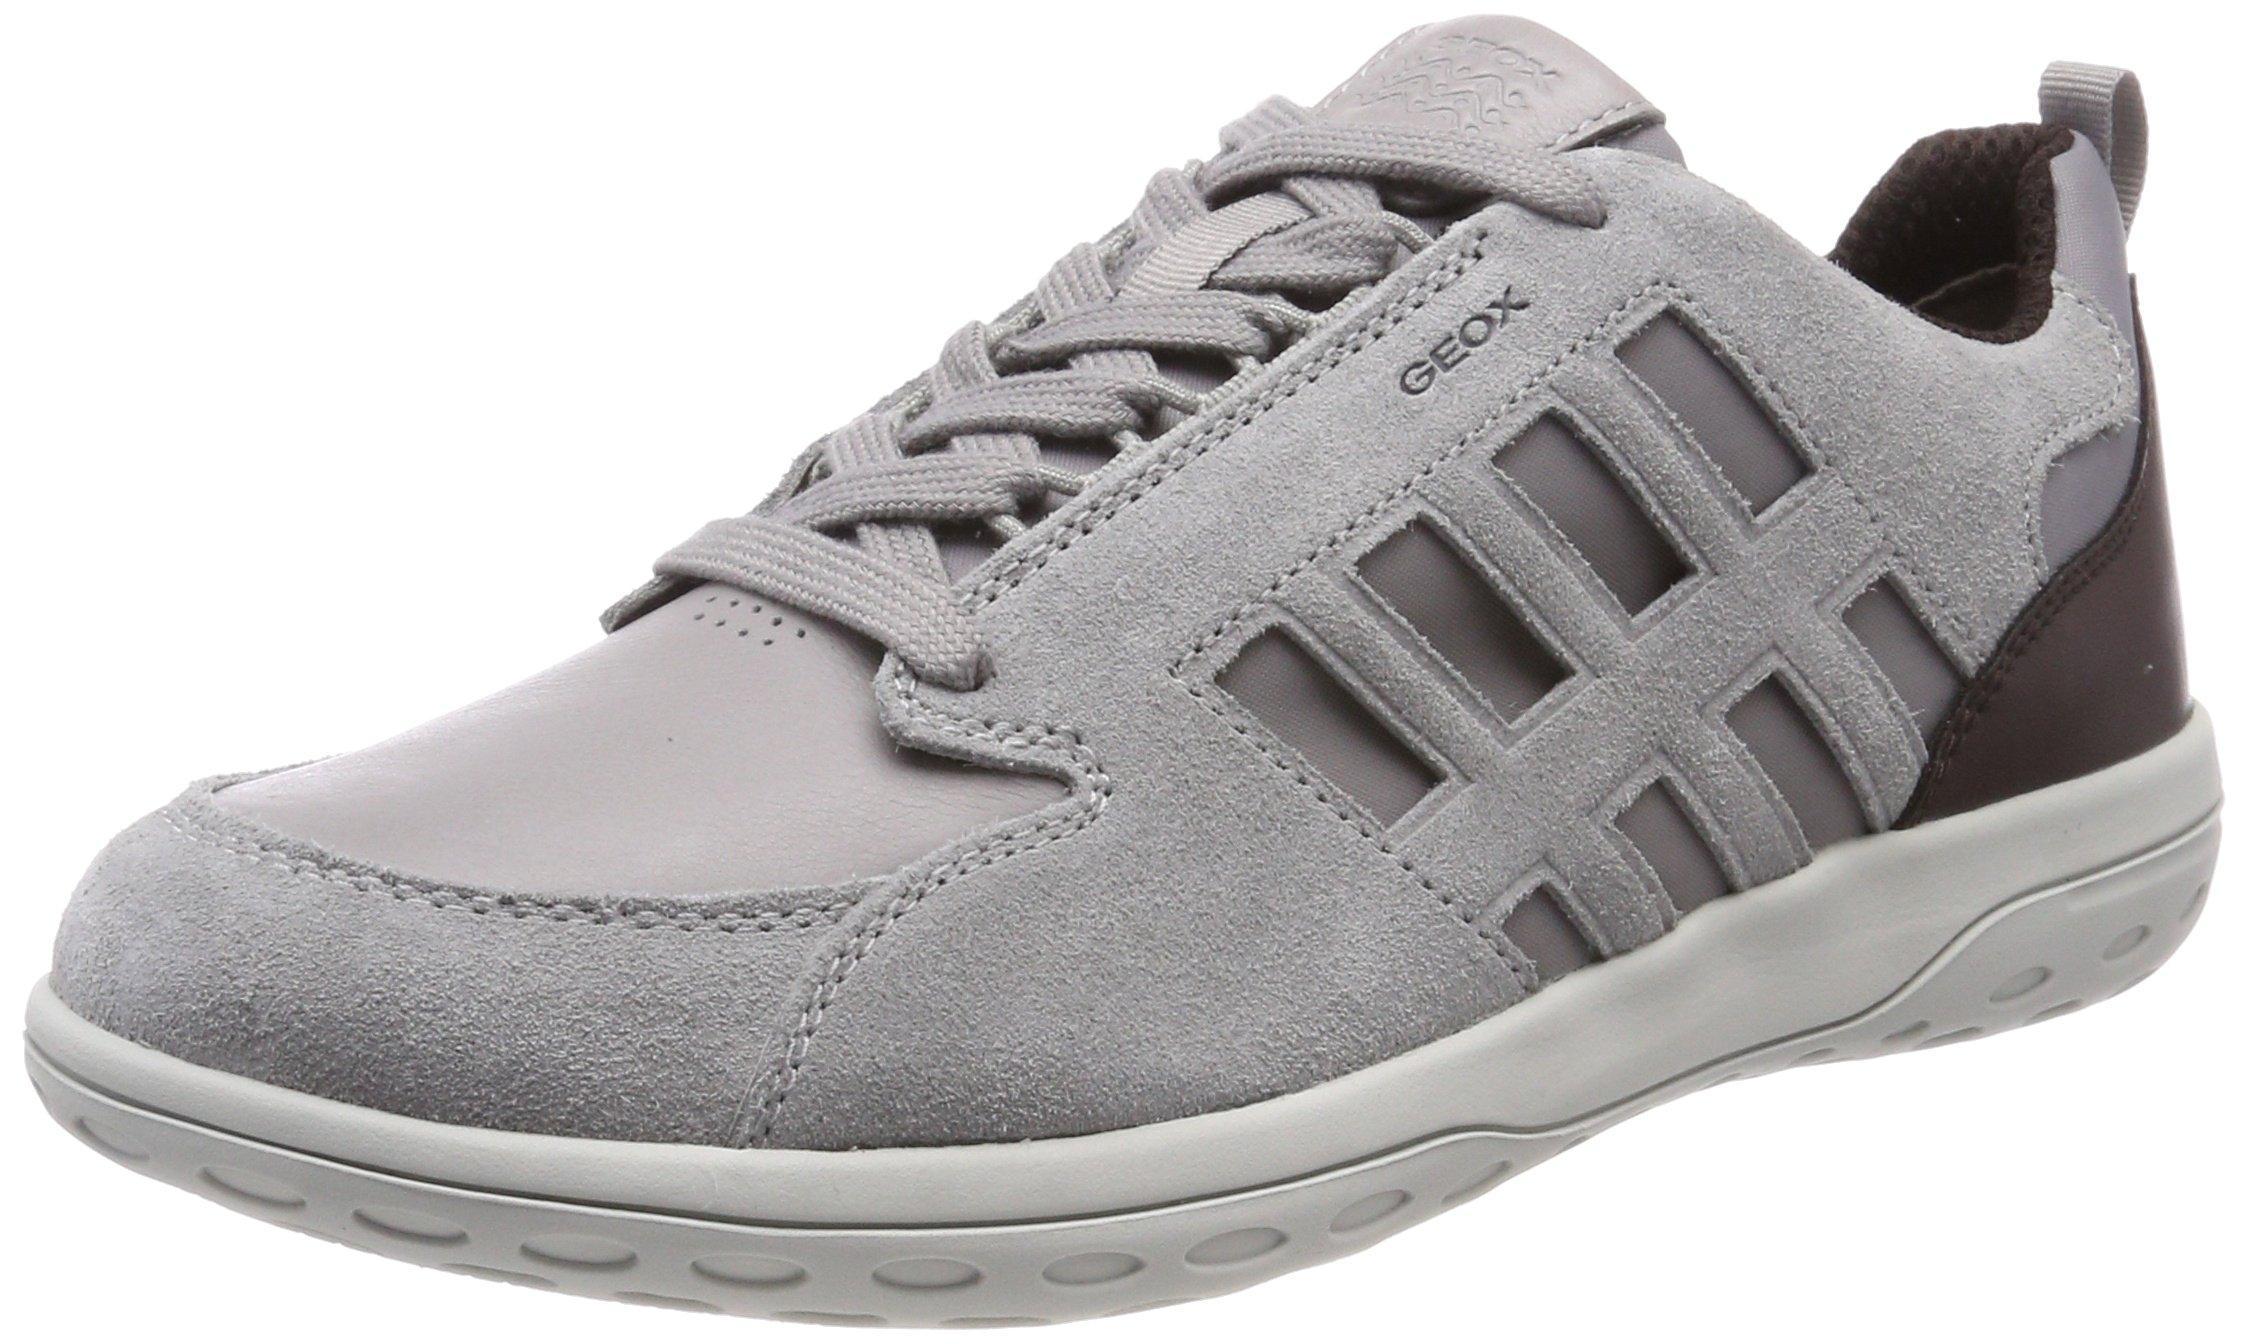 Mansel ASneakers Geox HommeGrislt U dk Grey Eu Burgundy43 Basses KcTJ5ul3F1